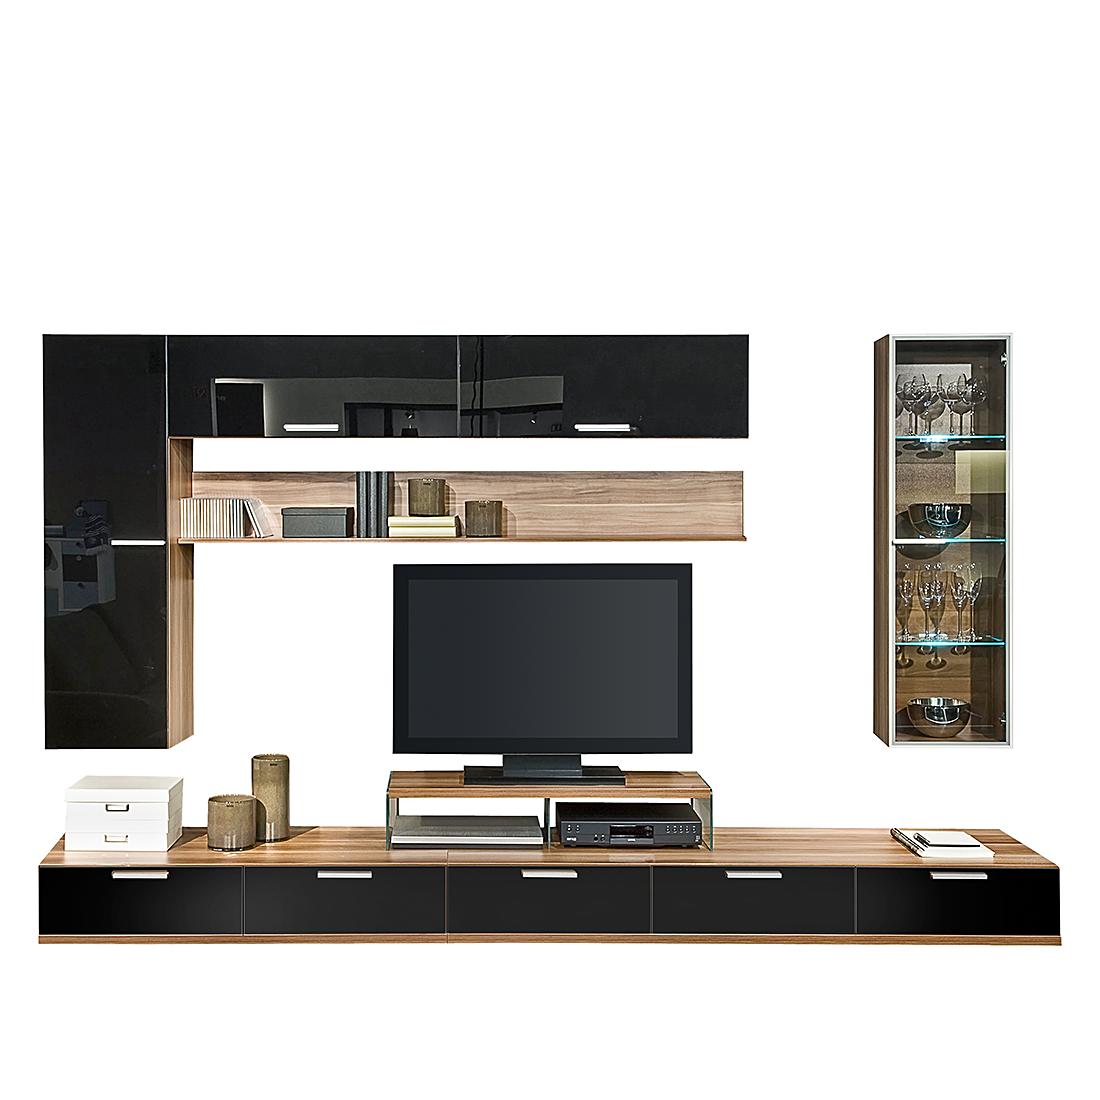 wohnwand schwarz glas hochglanz led b h t ca 280x190x45 cm korpus. Black Bedroom Furniture Sets. Home Design Ideas